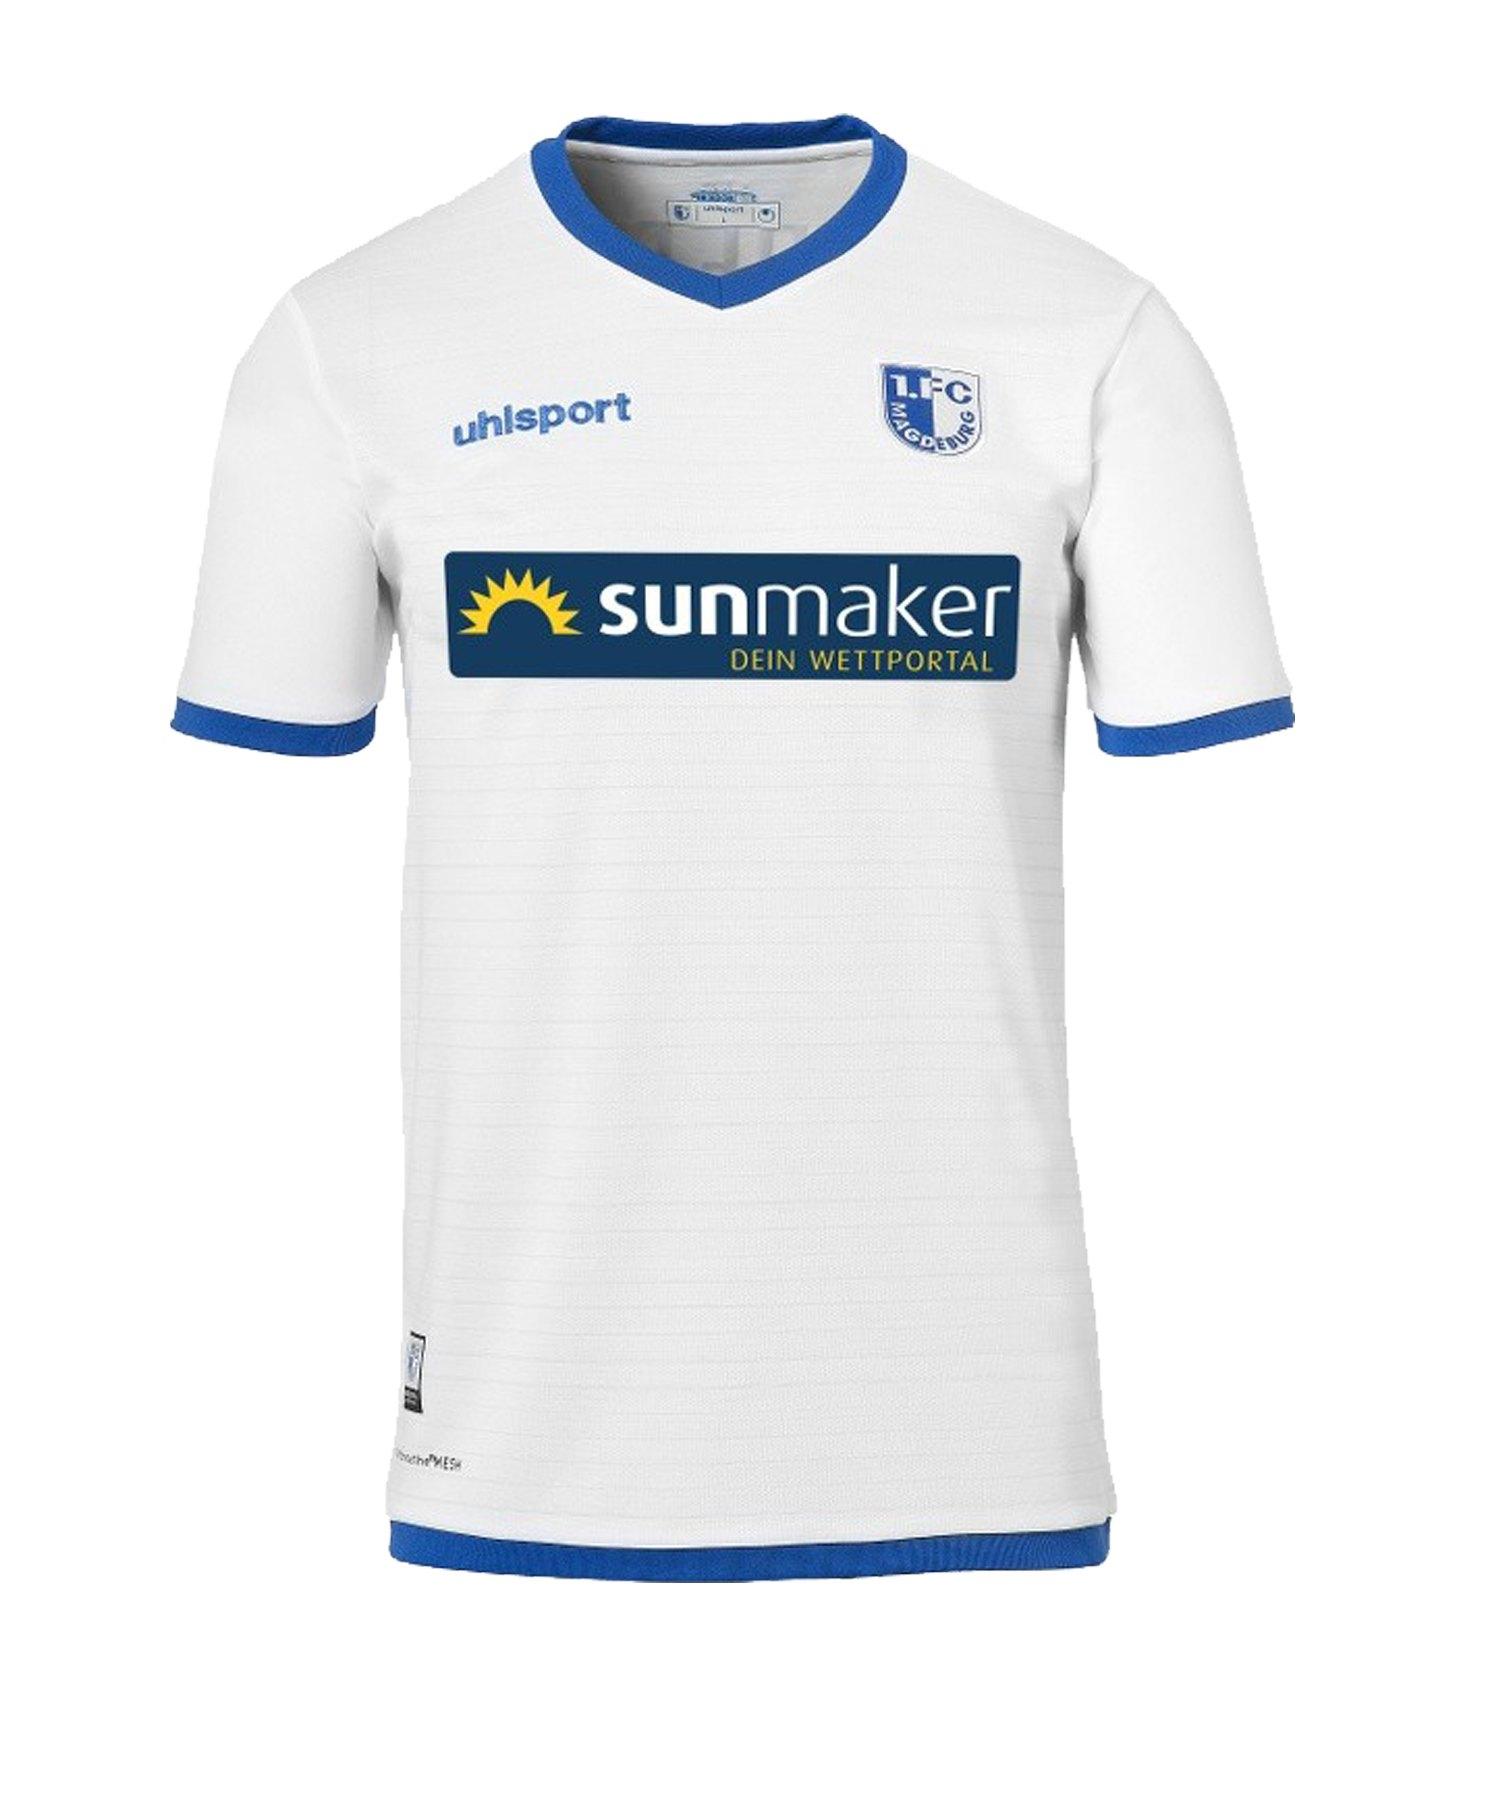 Uhlsport 1. FC Magdeburg Trikot Away Kids 19/20 - weiss